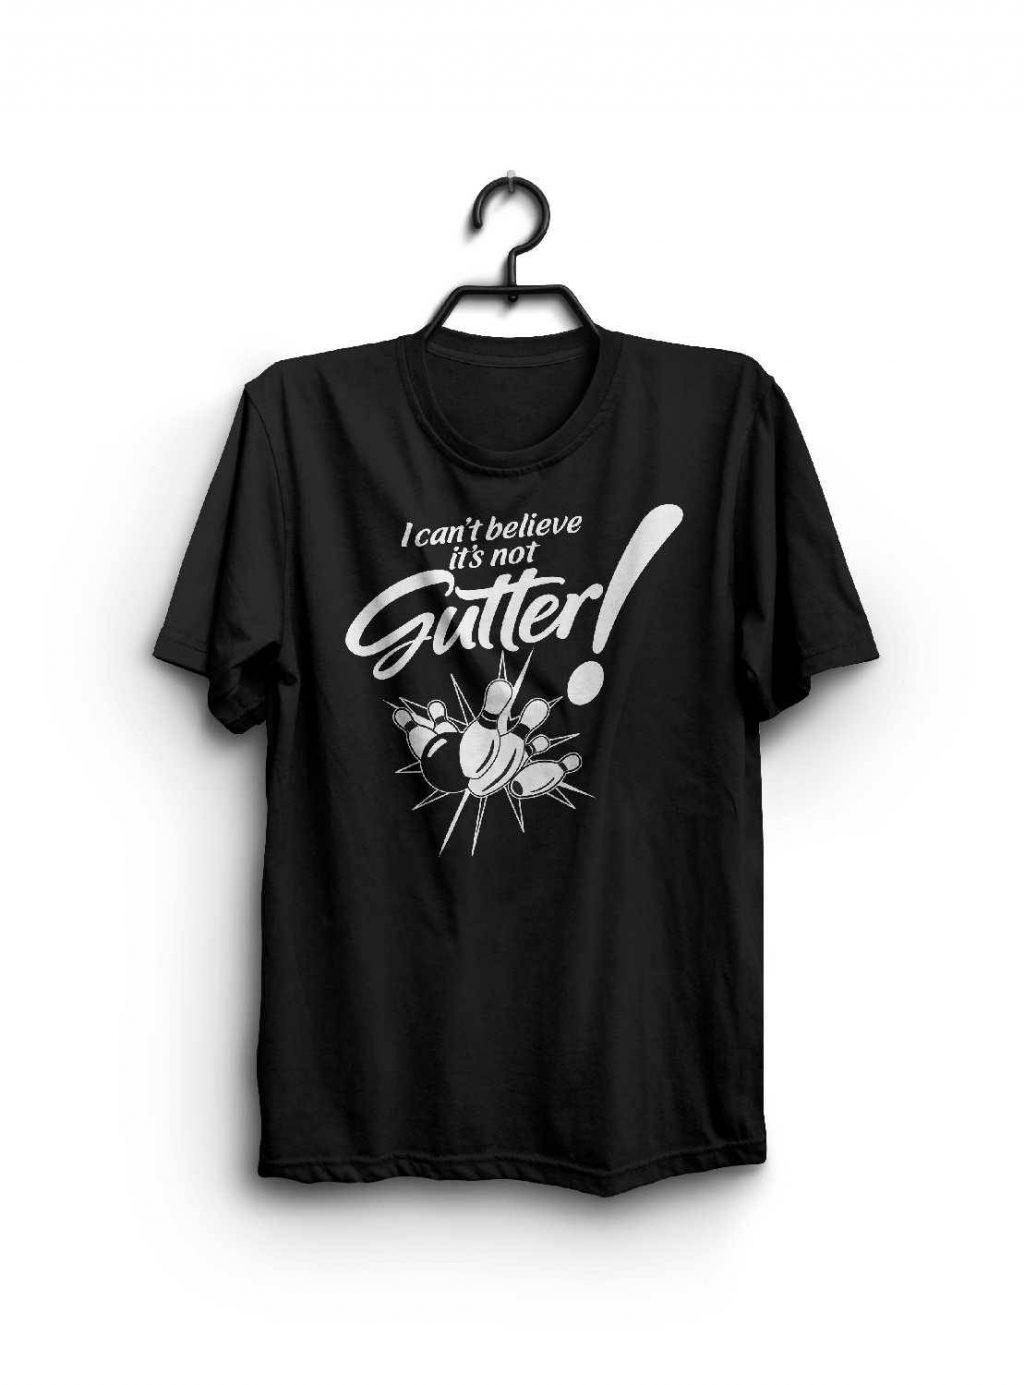 bda2a772d I Can't Believe It's Not Gutter – Funny Bowling Shirt – Bowling Shirt – Funny  Shirt – Bowling League Shirt – Funny Bowling Team Shirt